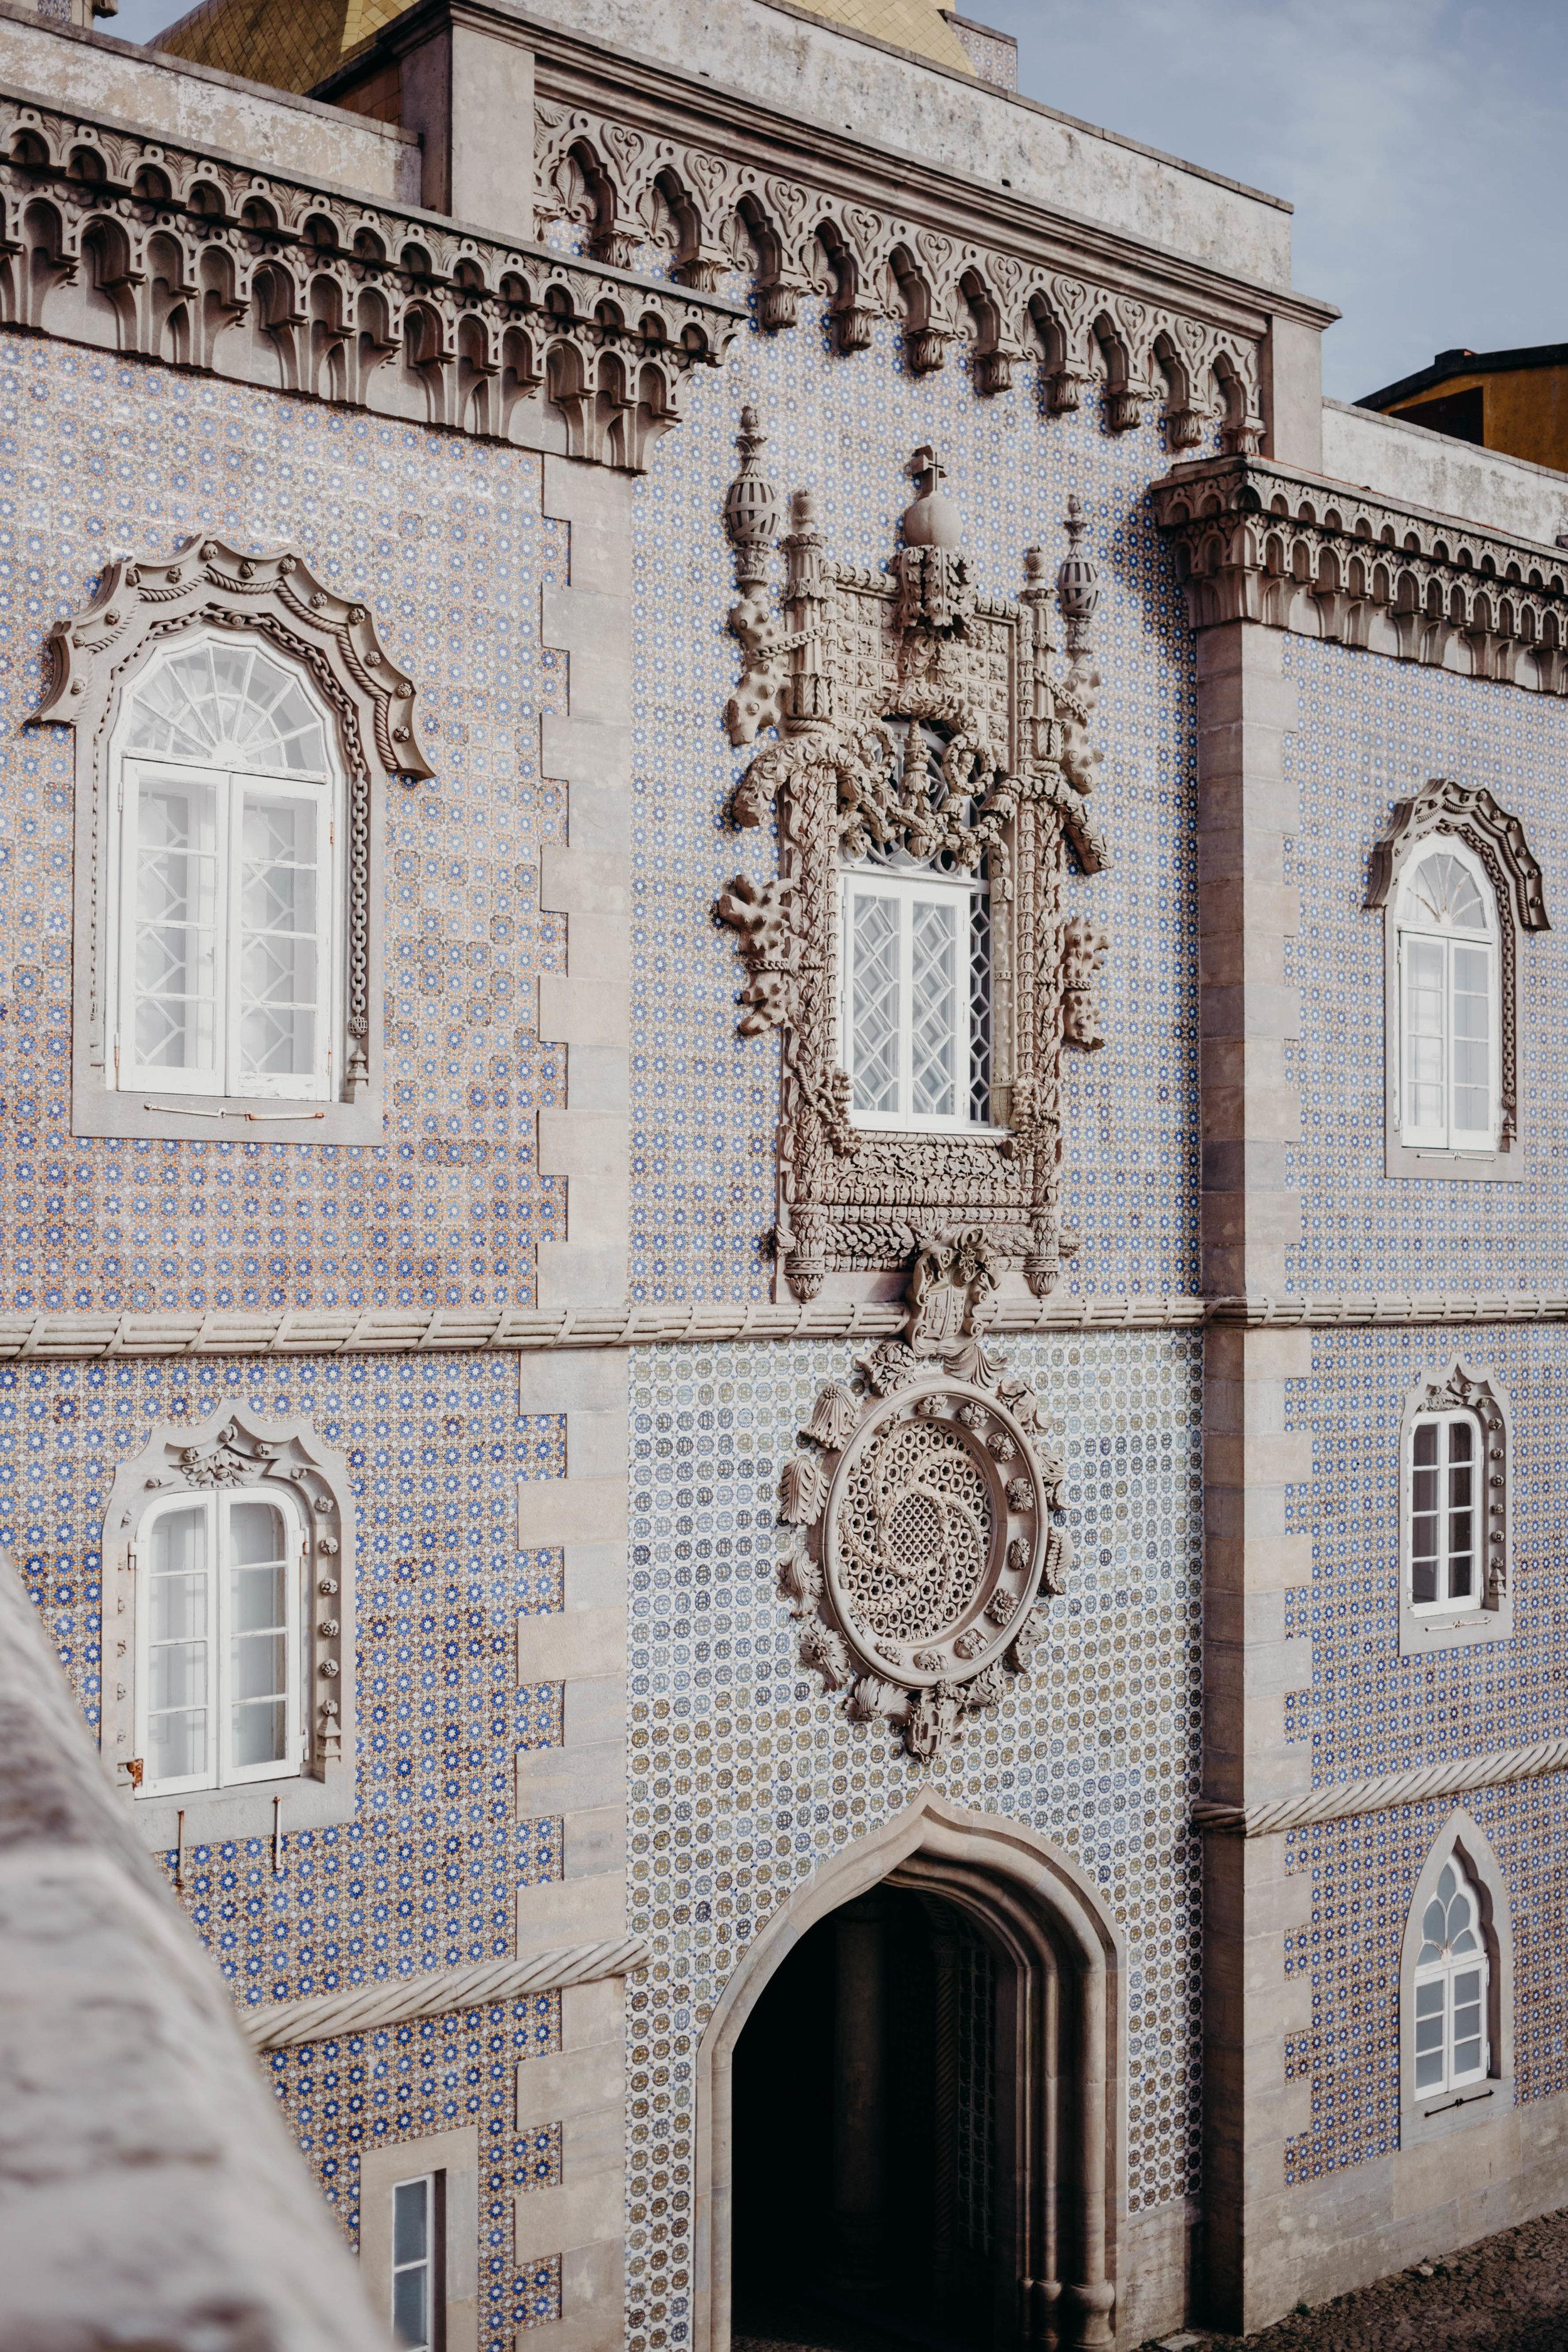 Our Portugal Travel Diary: Lisbon, Porto, and More | On the Street Where We Live (aretherelilactrees.com)  Sintra, Palacio da Pena, Pena Palace, National Palace of Pena